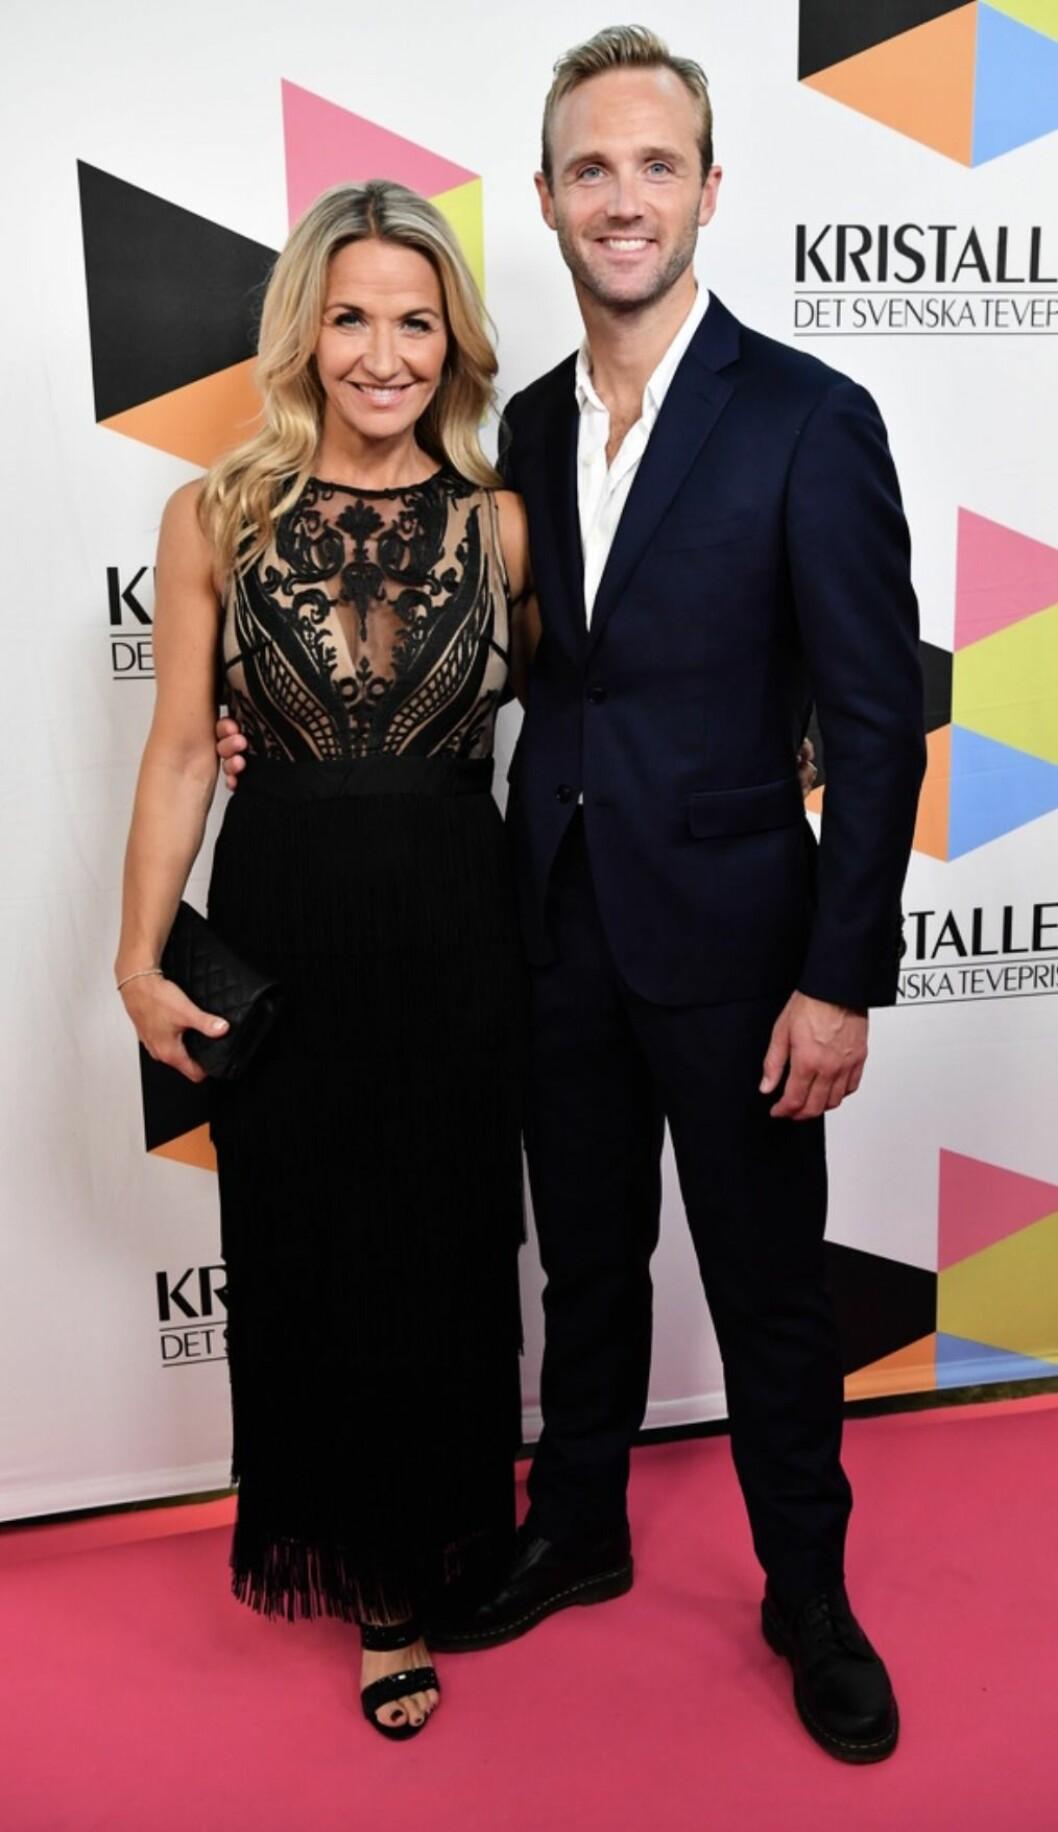 Kristin Kaspersen och Calle Sterner på Kristallen-galan, 2019